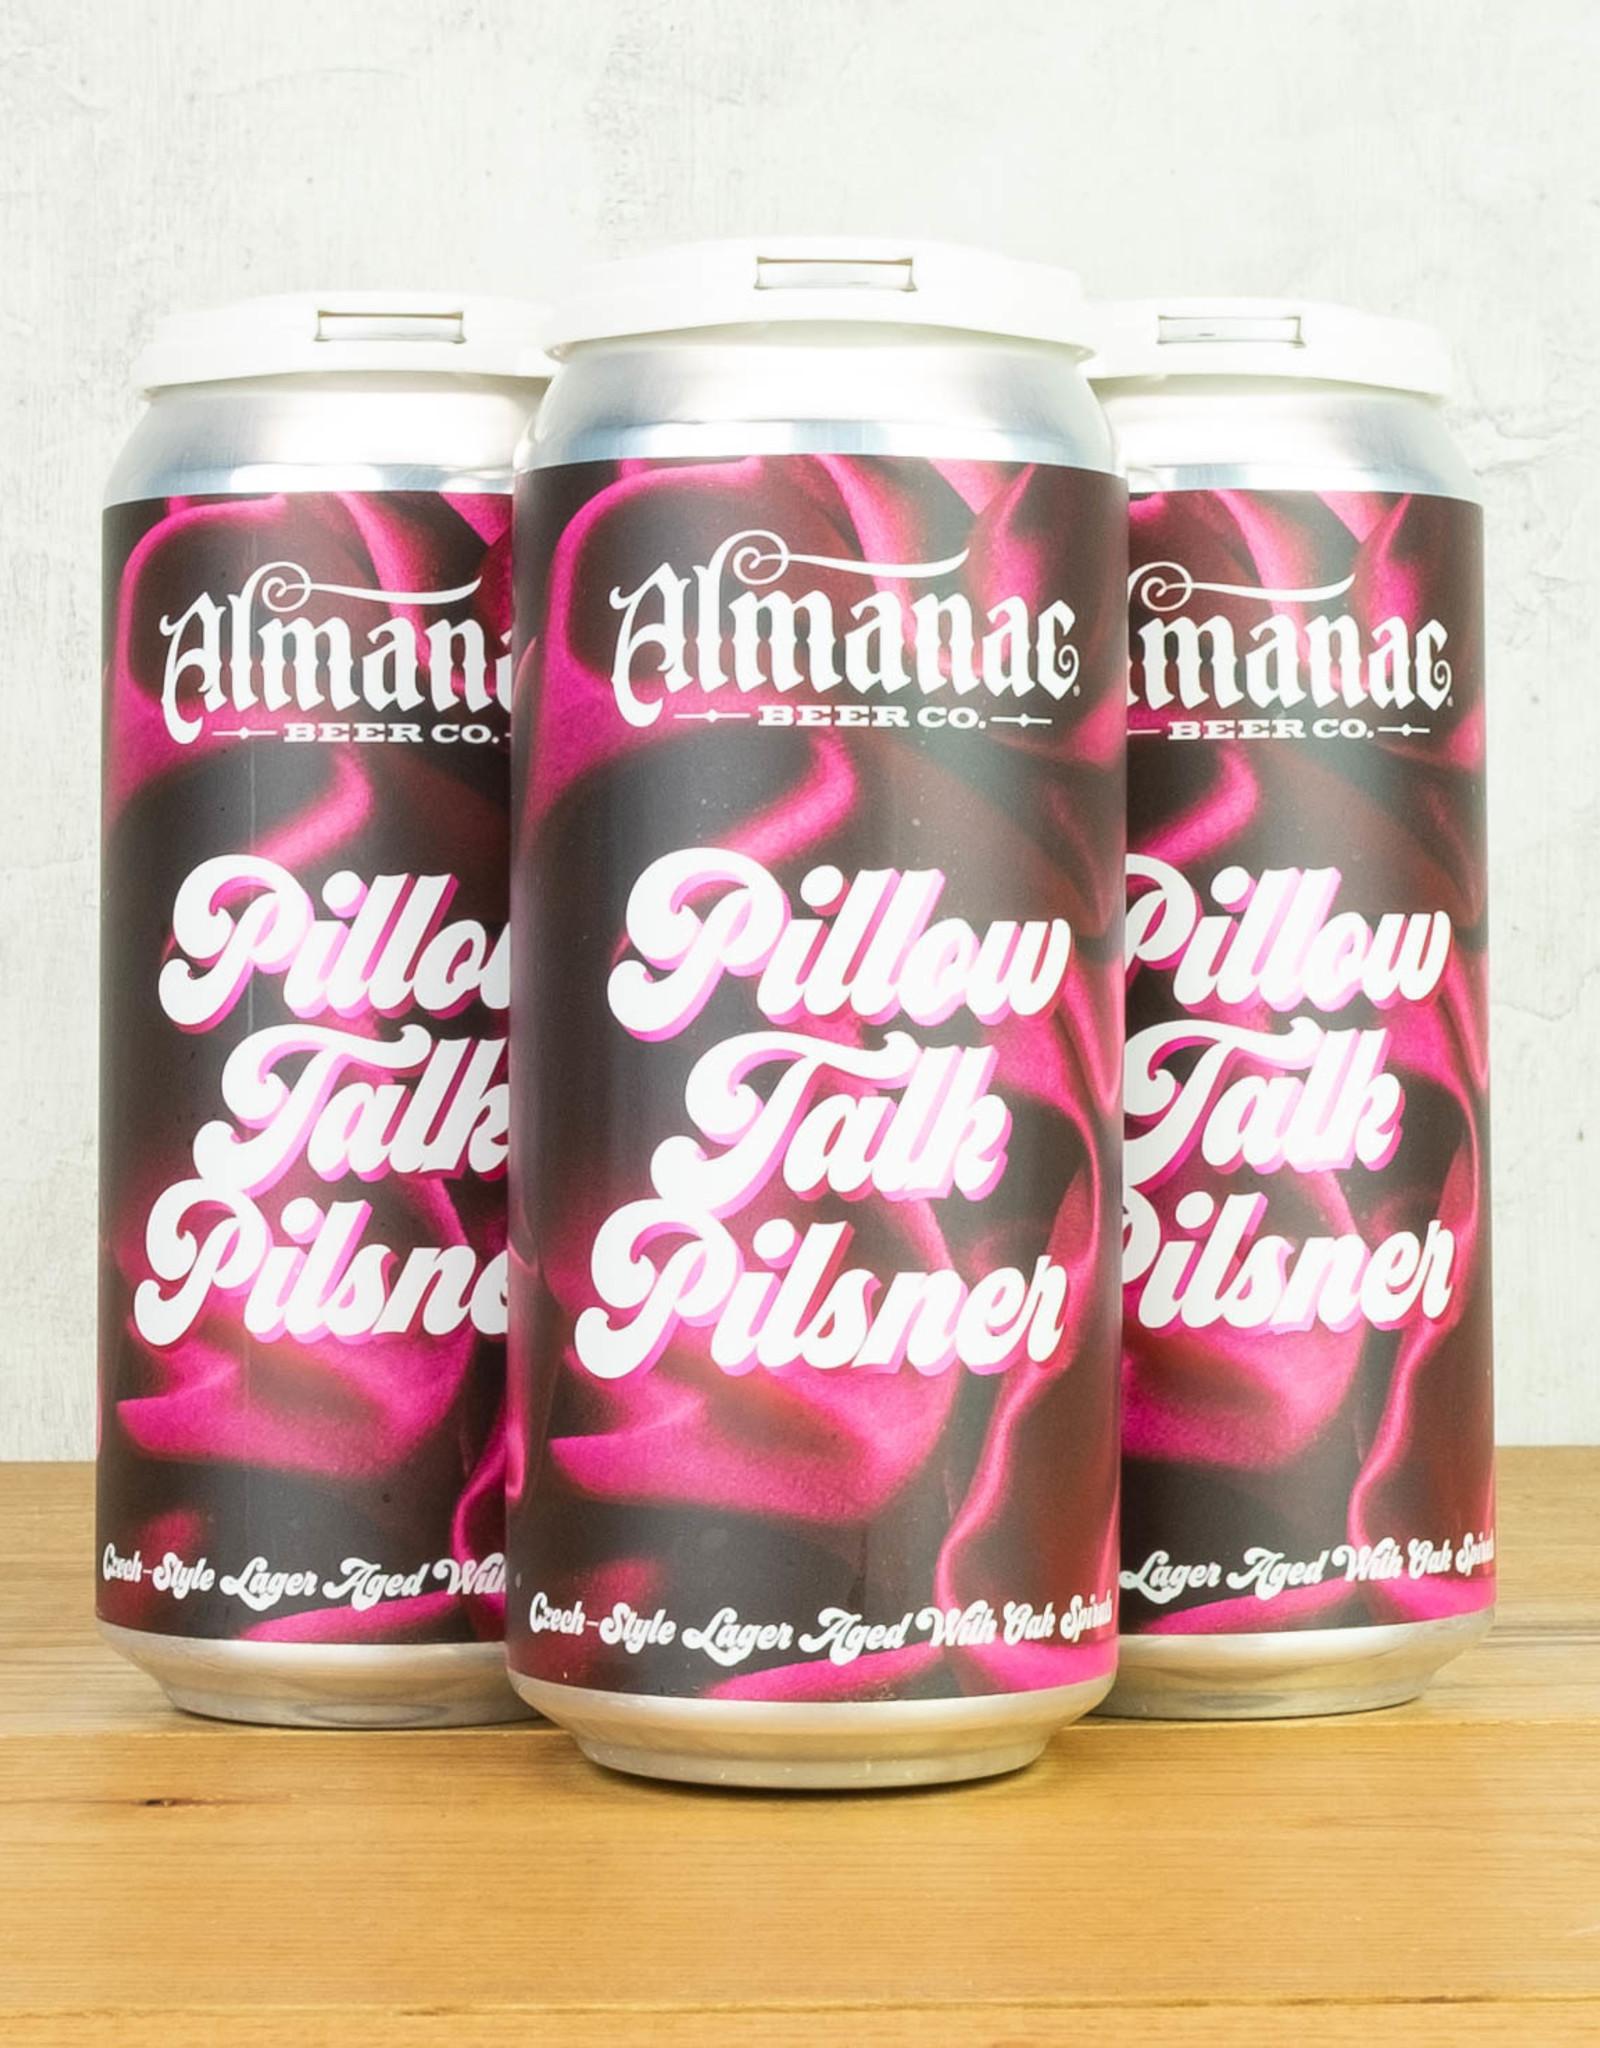 Almanac Pillow Talk Pilsner 4pk